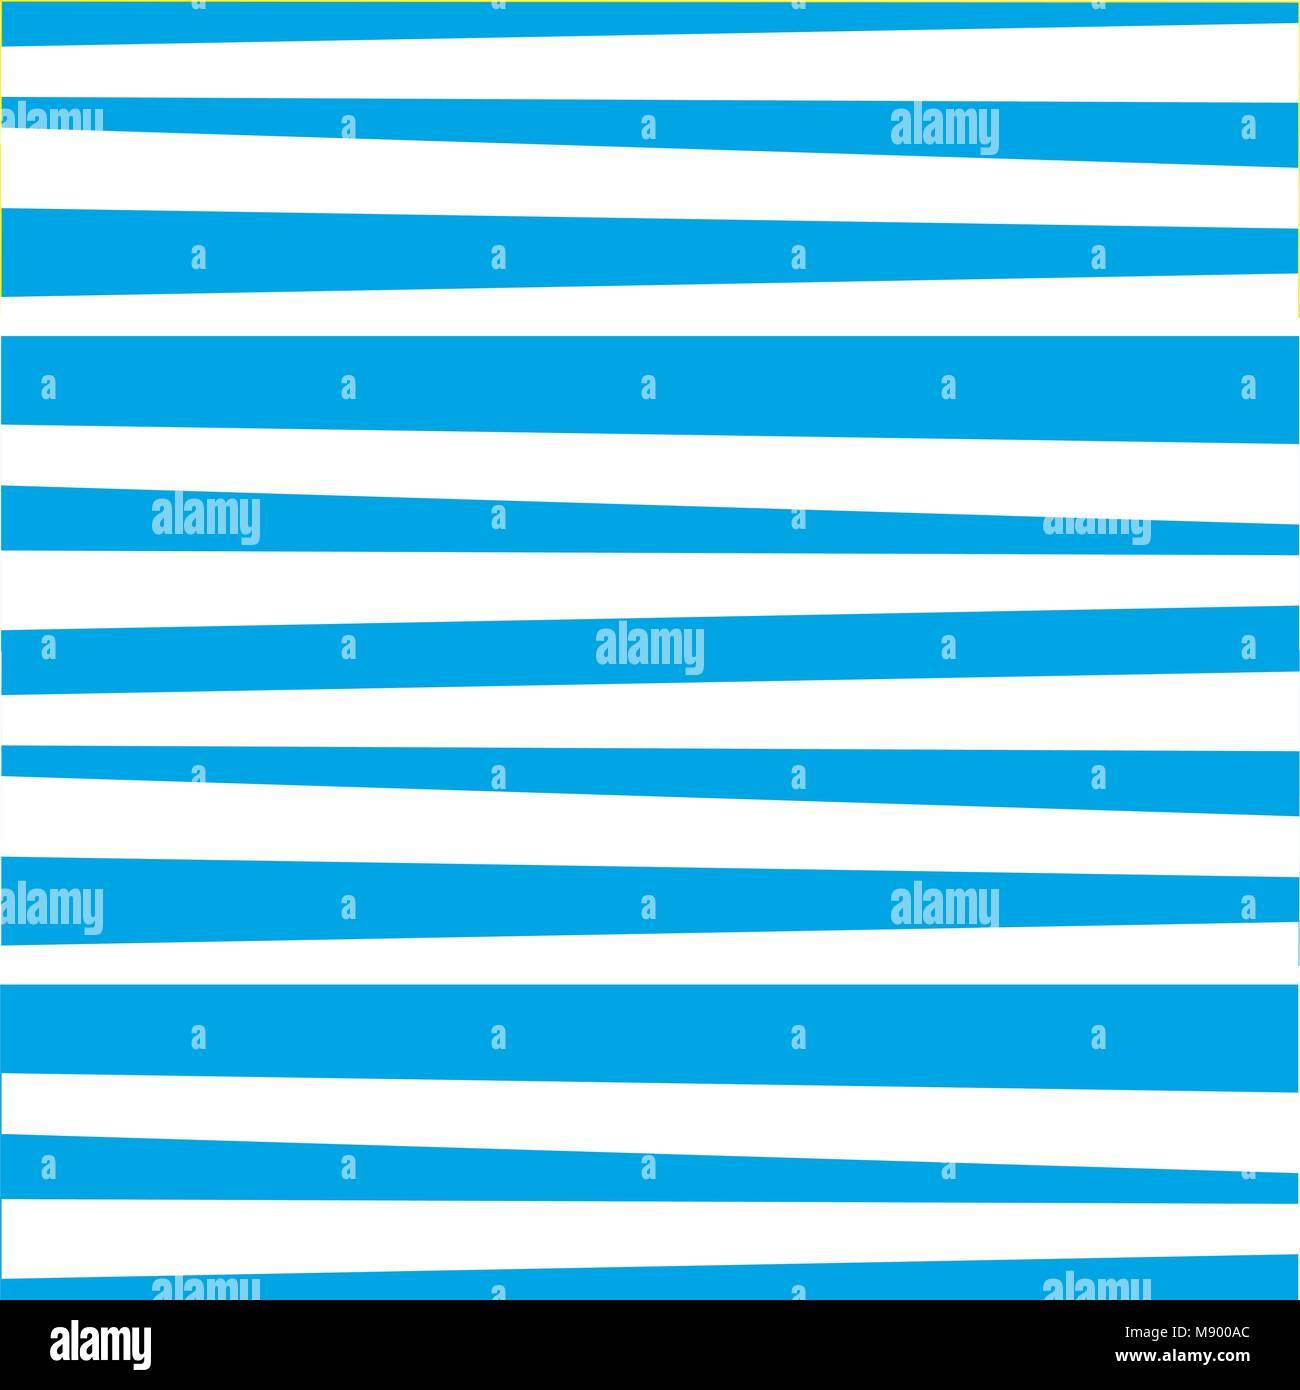 Resume Motif A Rayures Horizontales Bleu Marine Et Blanc Arriere